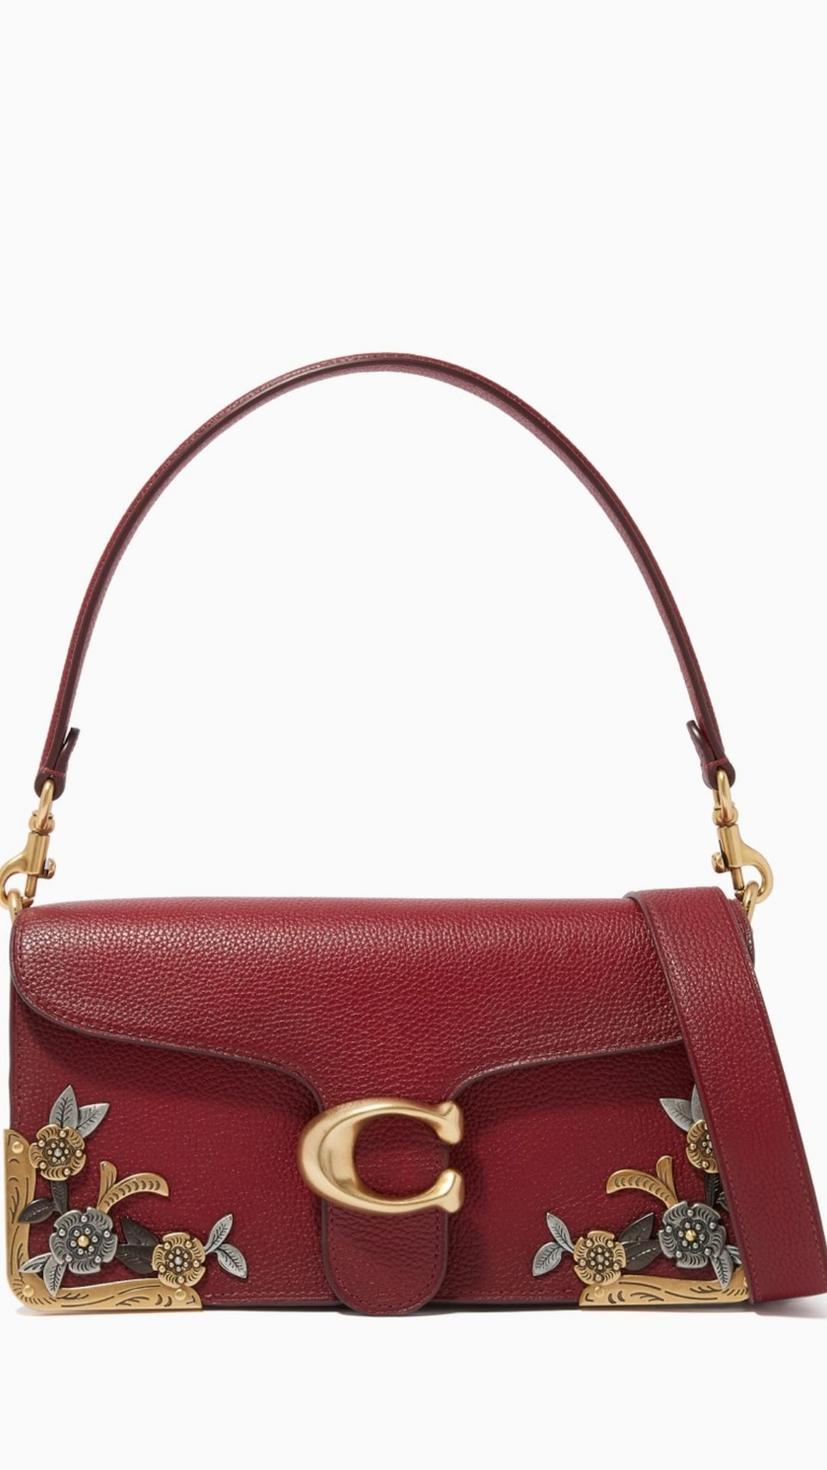 Shoulder bag, Friends, Rachel green, Jennifer Aniston, Style Inspo, Get the look, Fashion, Bags